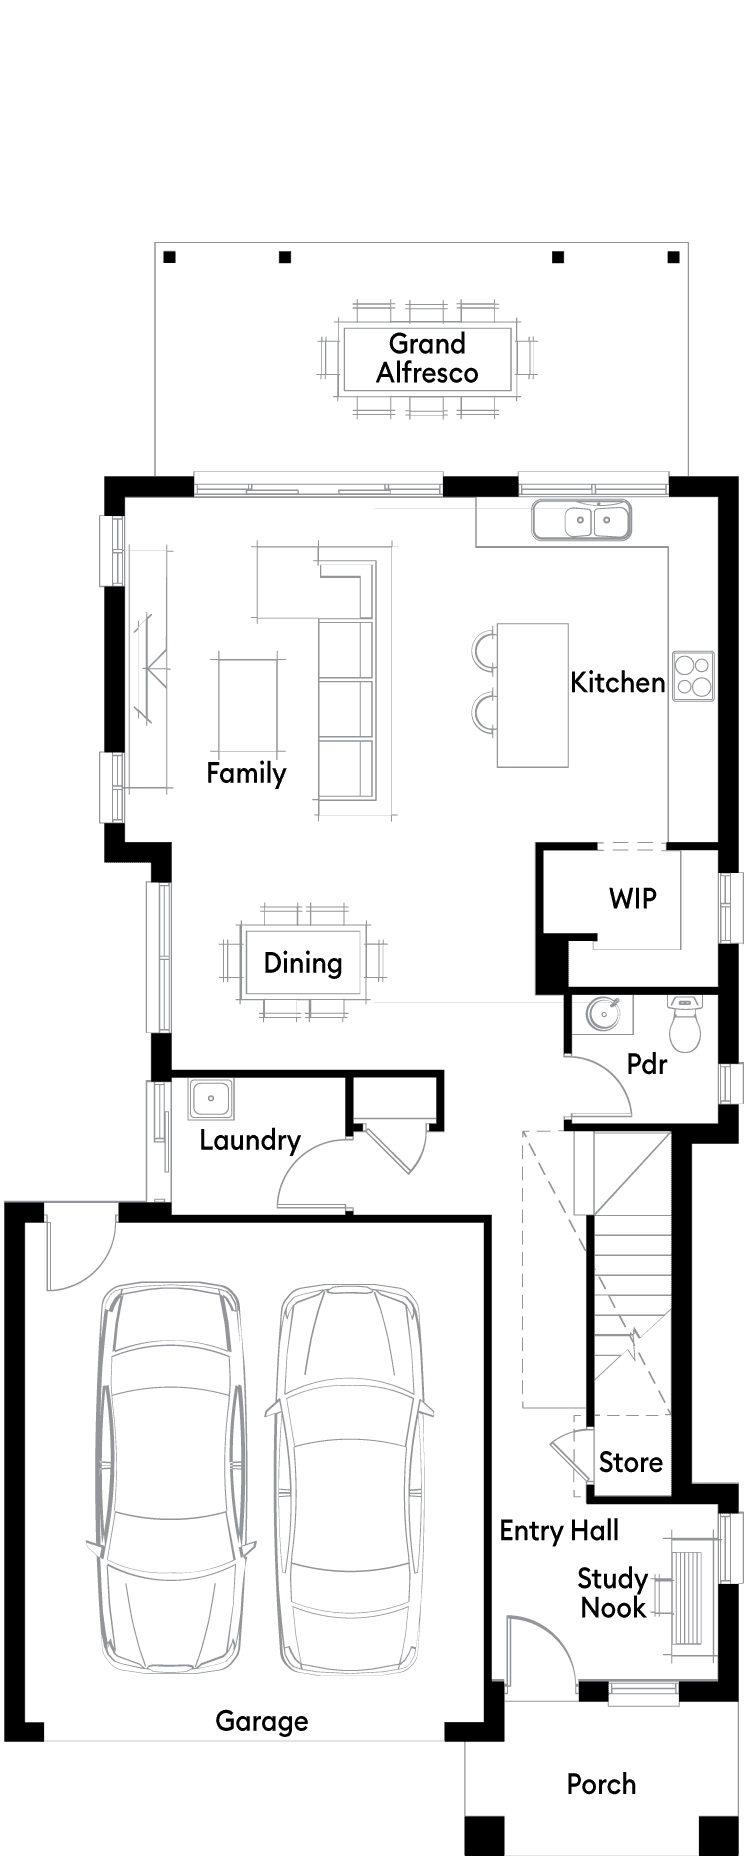 FloorPlan1_HOUSE852_Charlton_28MK2-01